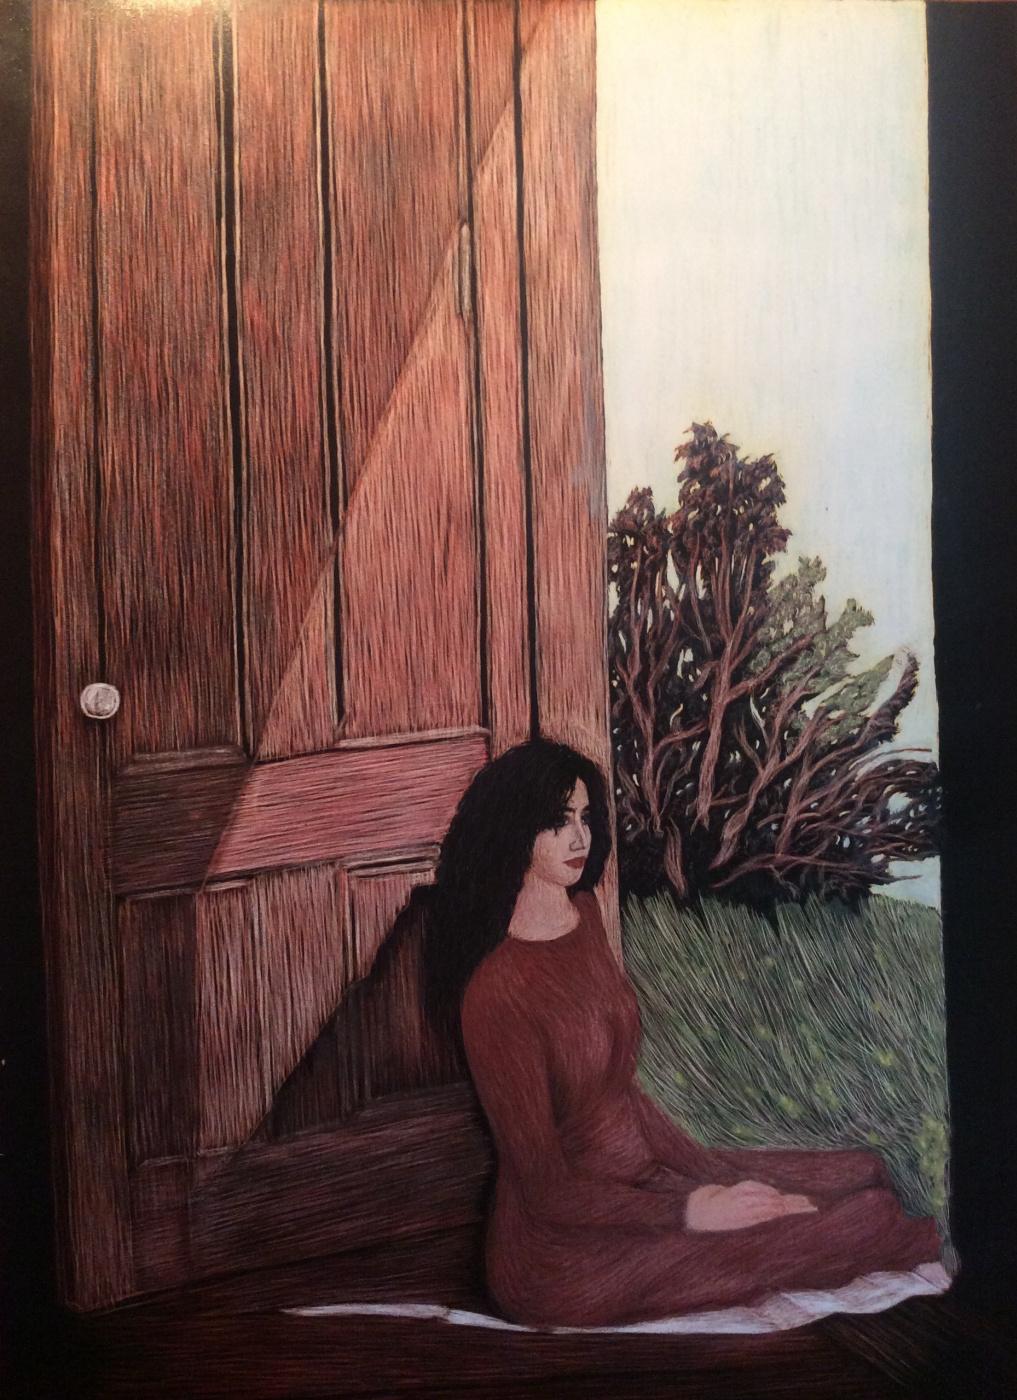 Martin Gurgenovich Ashkhatoev. Laura based on Andrew Wyeth's painting by Christina Olson (1947)